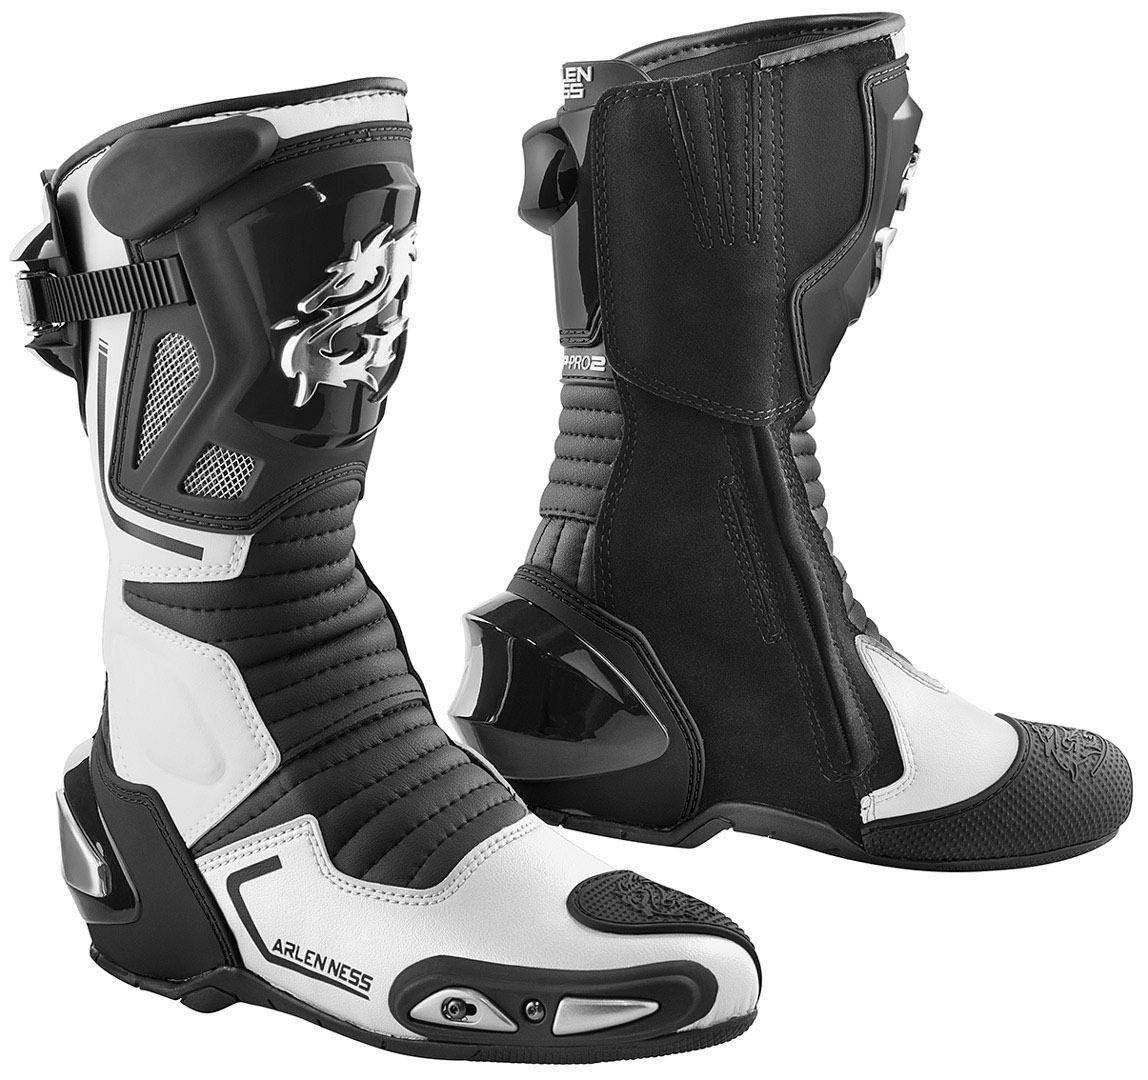 Arlen Ness Sugello Bottes de moto Noir Blanc taille : 44